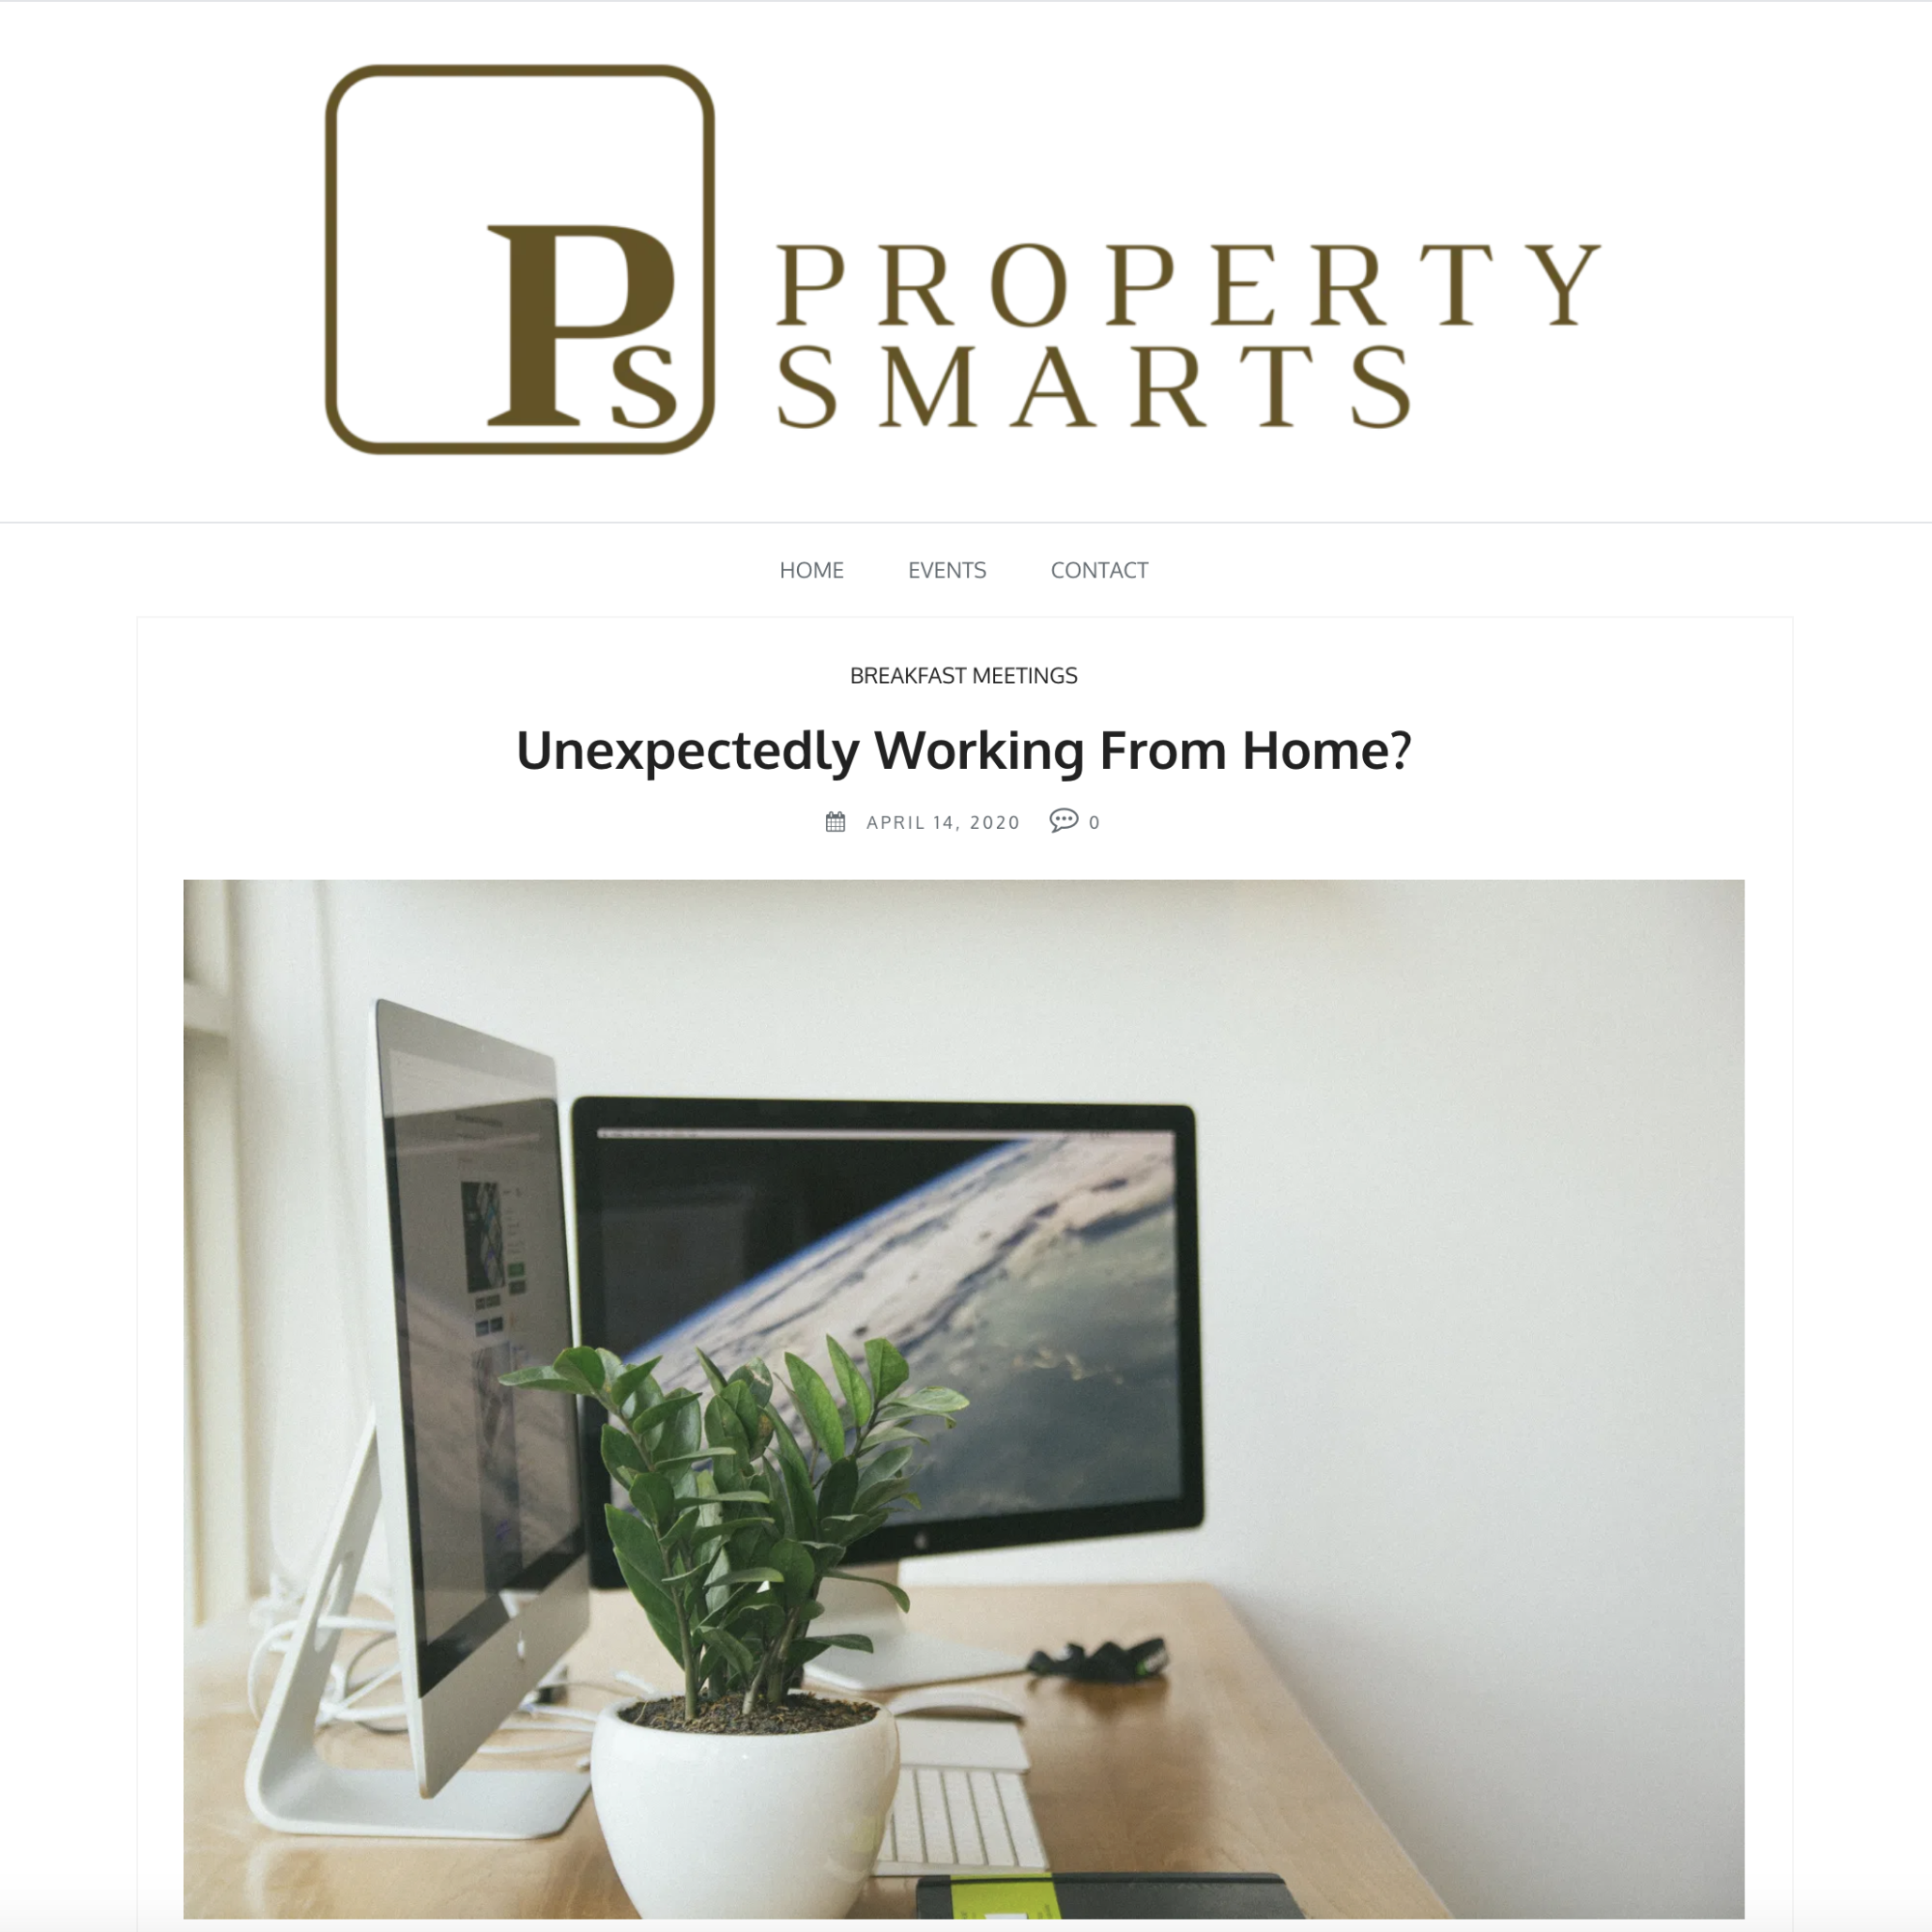 Property Smarts